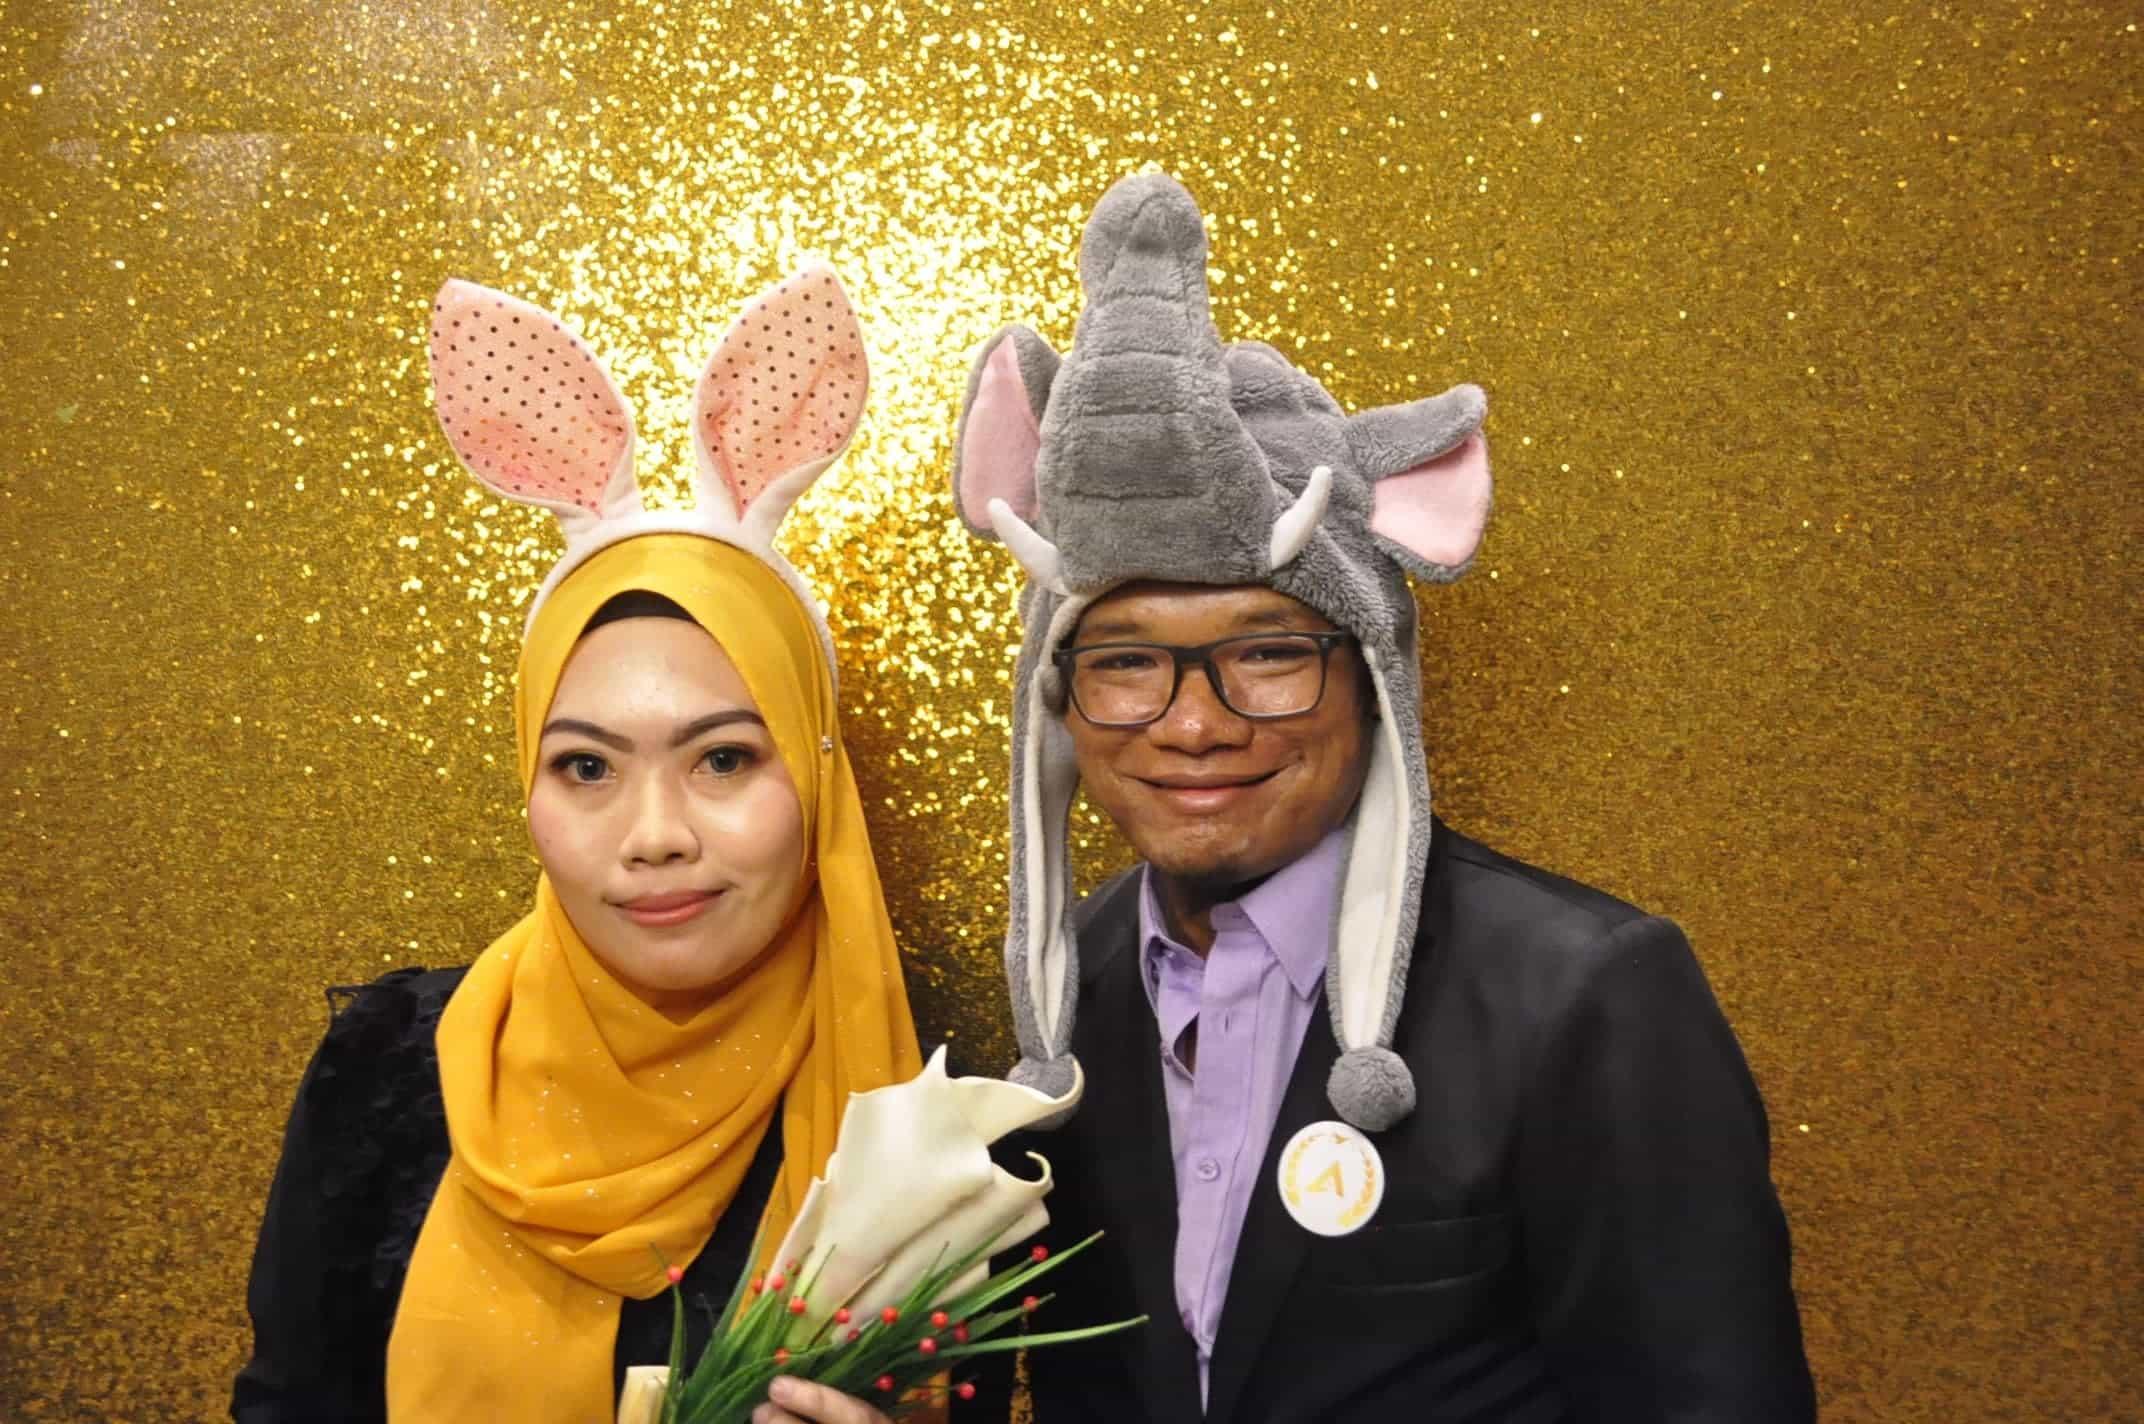 Malam Gala Anggun 2018 (Photobooth) 38